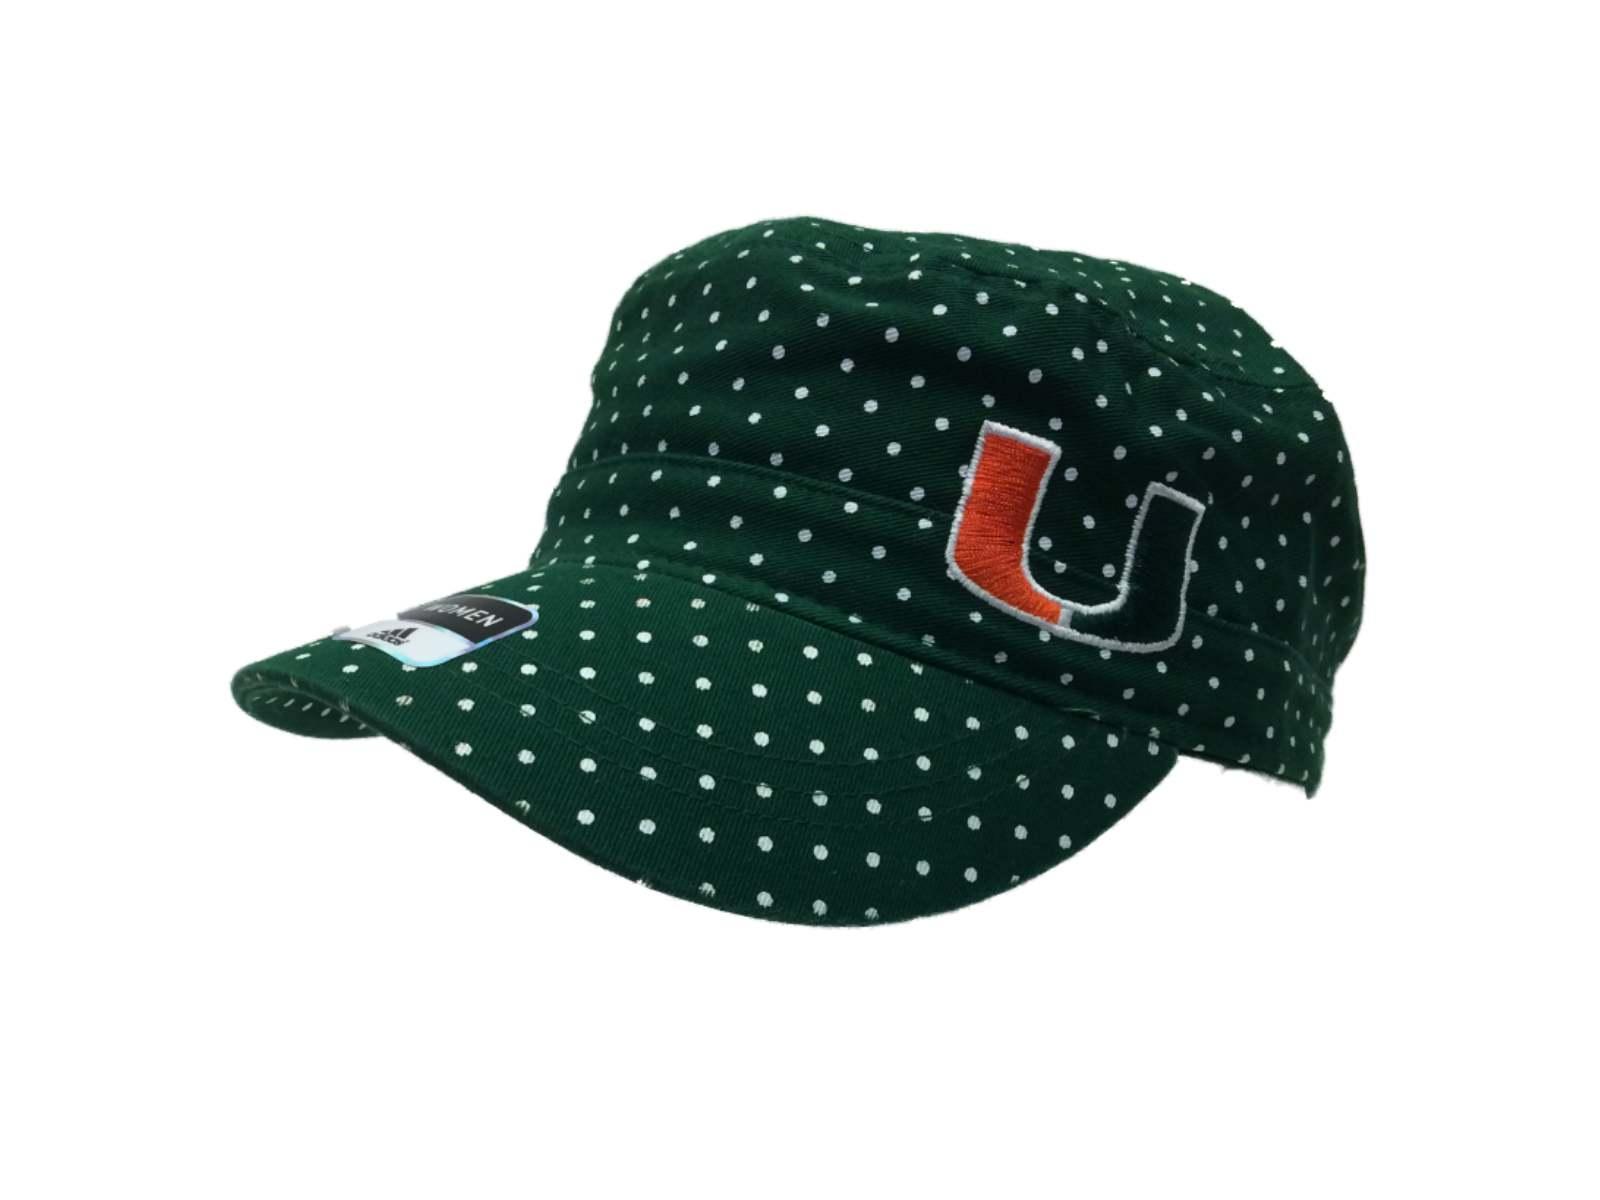 Miami Hurricanes Adidas WOMEN S Green Polka Dot Snapback Bootcamp Hat Cap a278018b1914